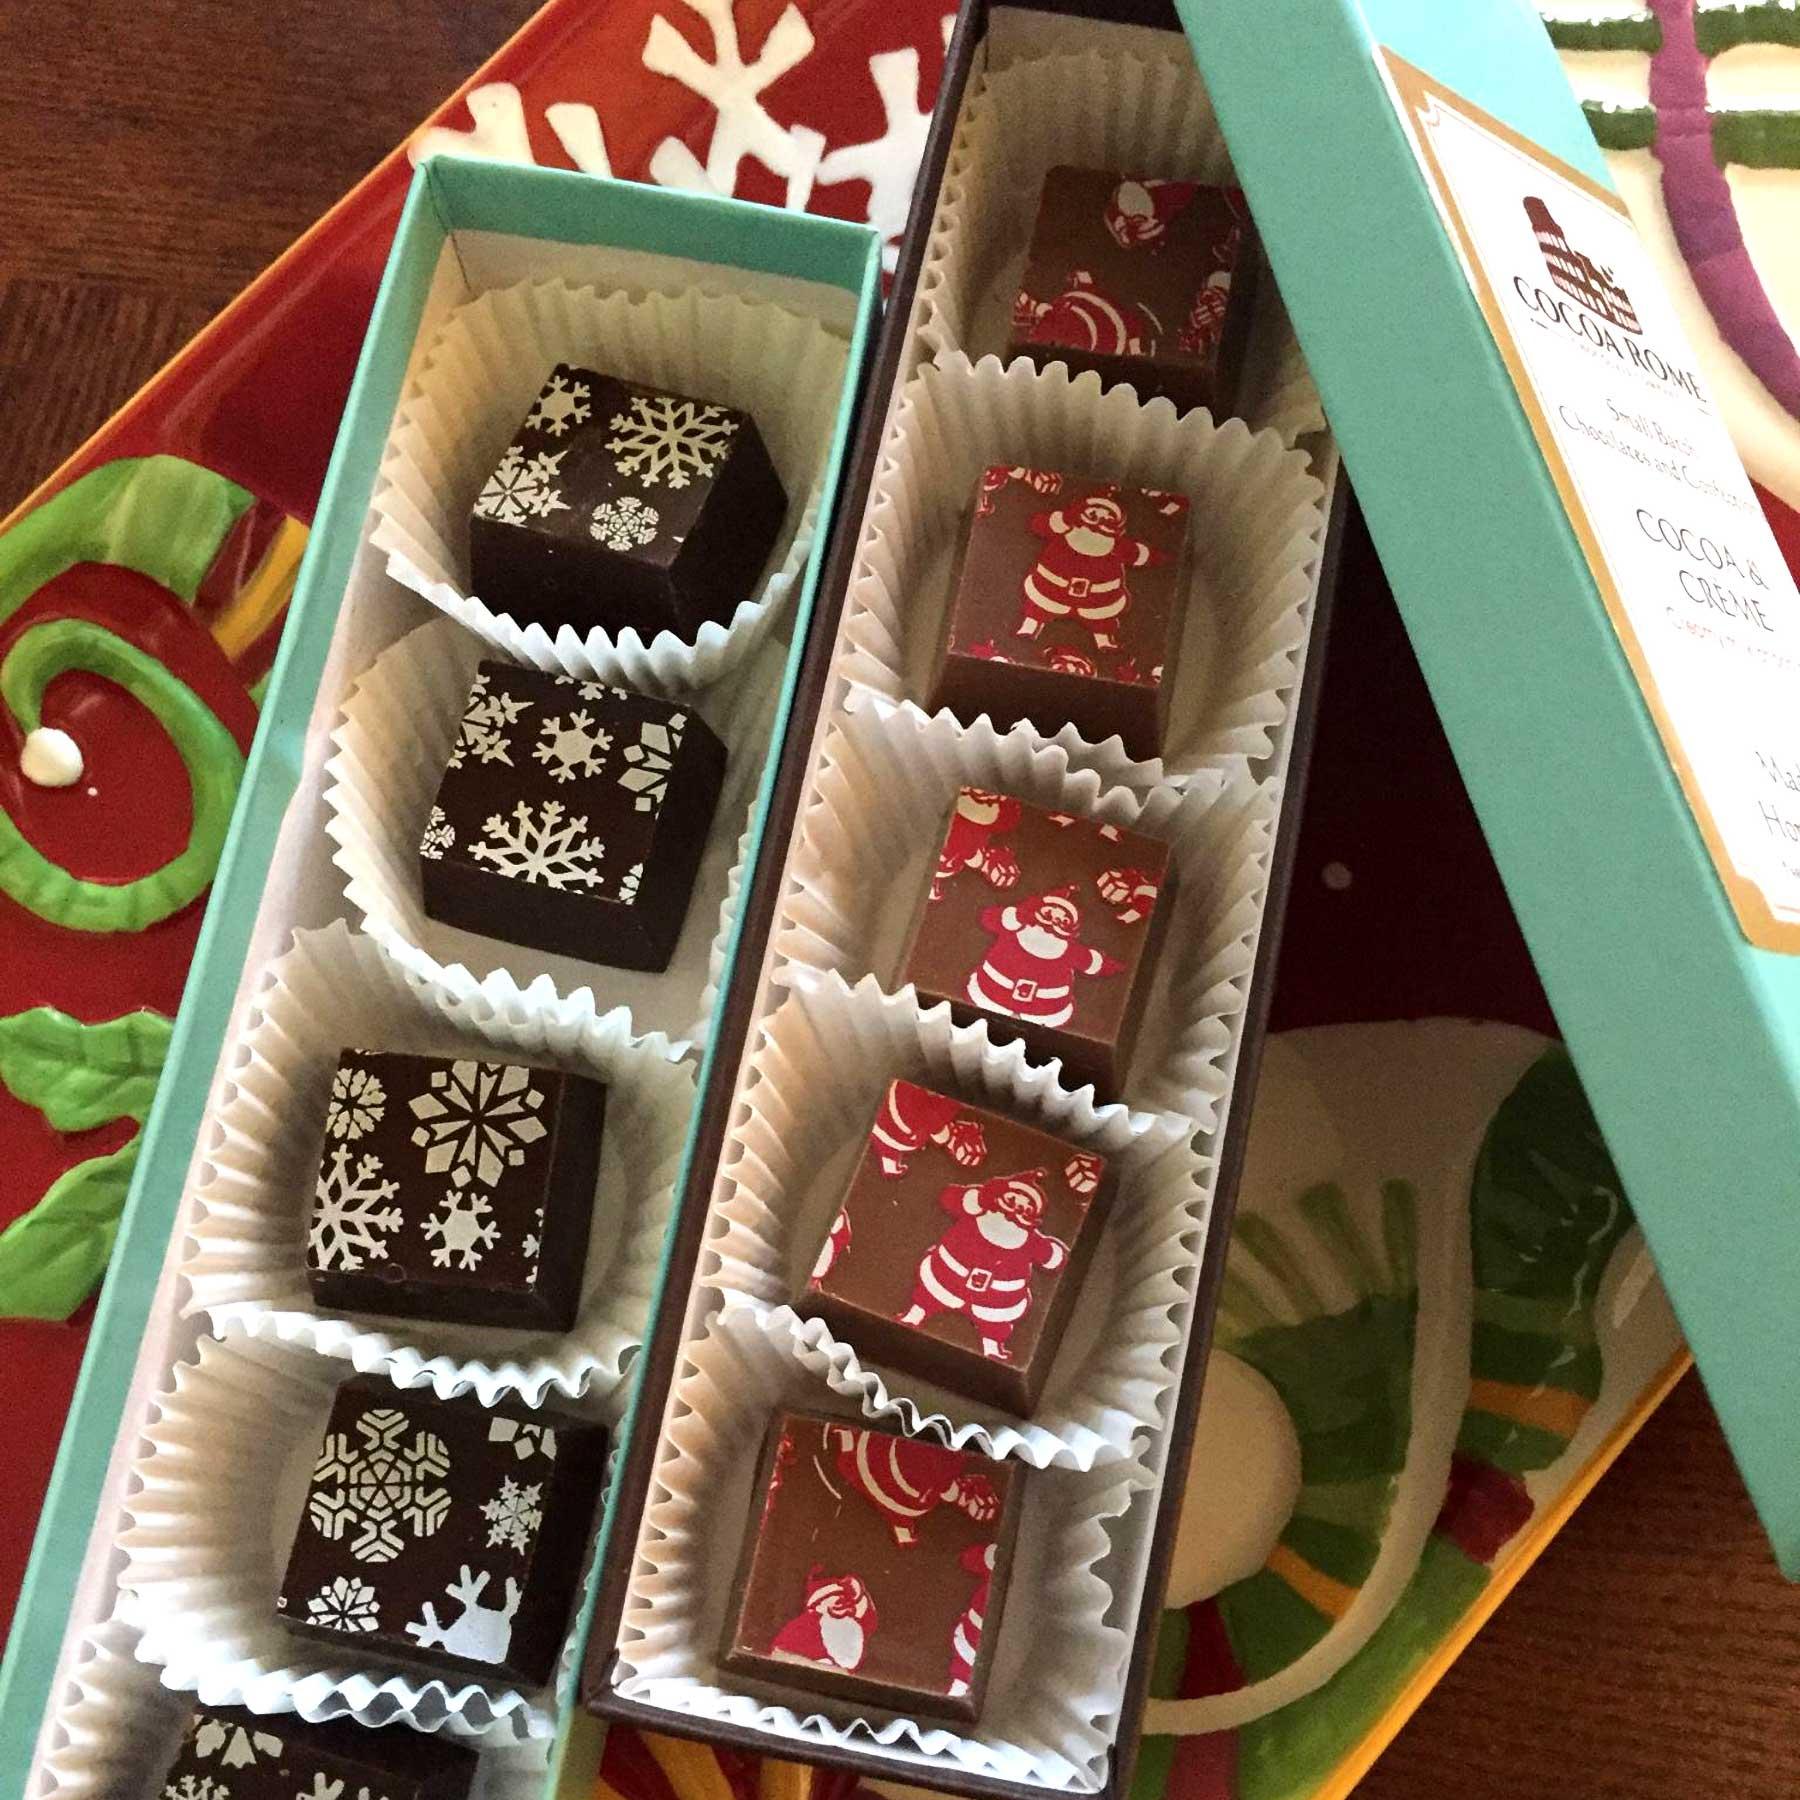 Cocoa Rome Chocolate Company